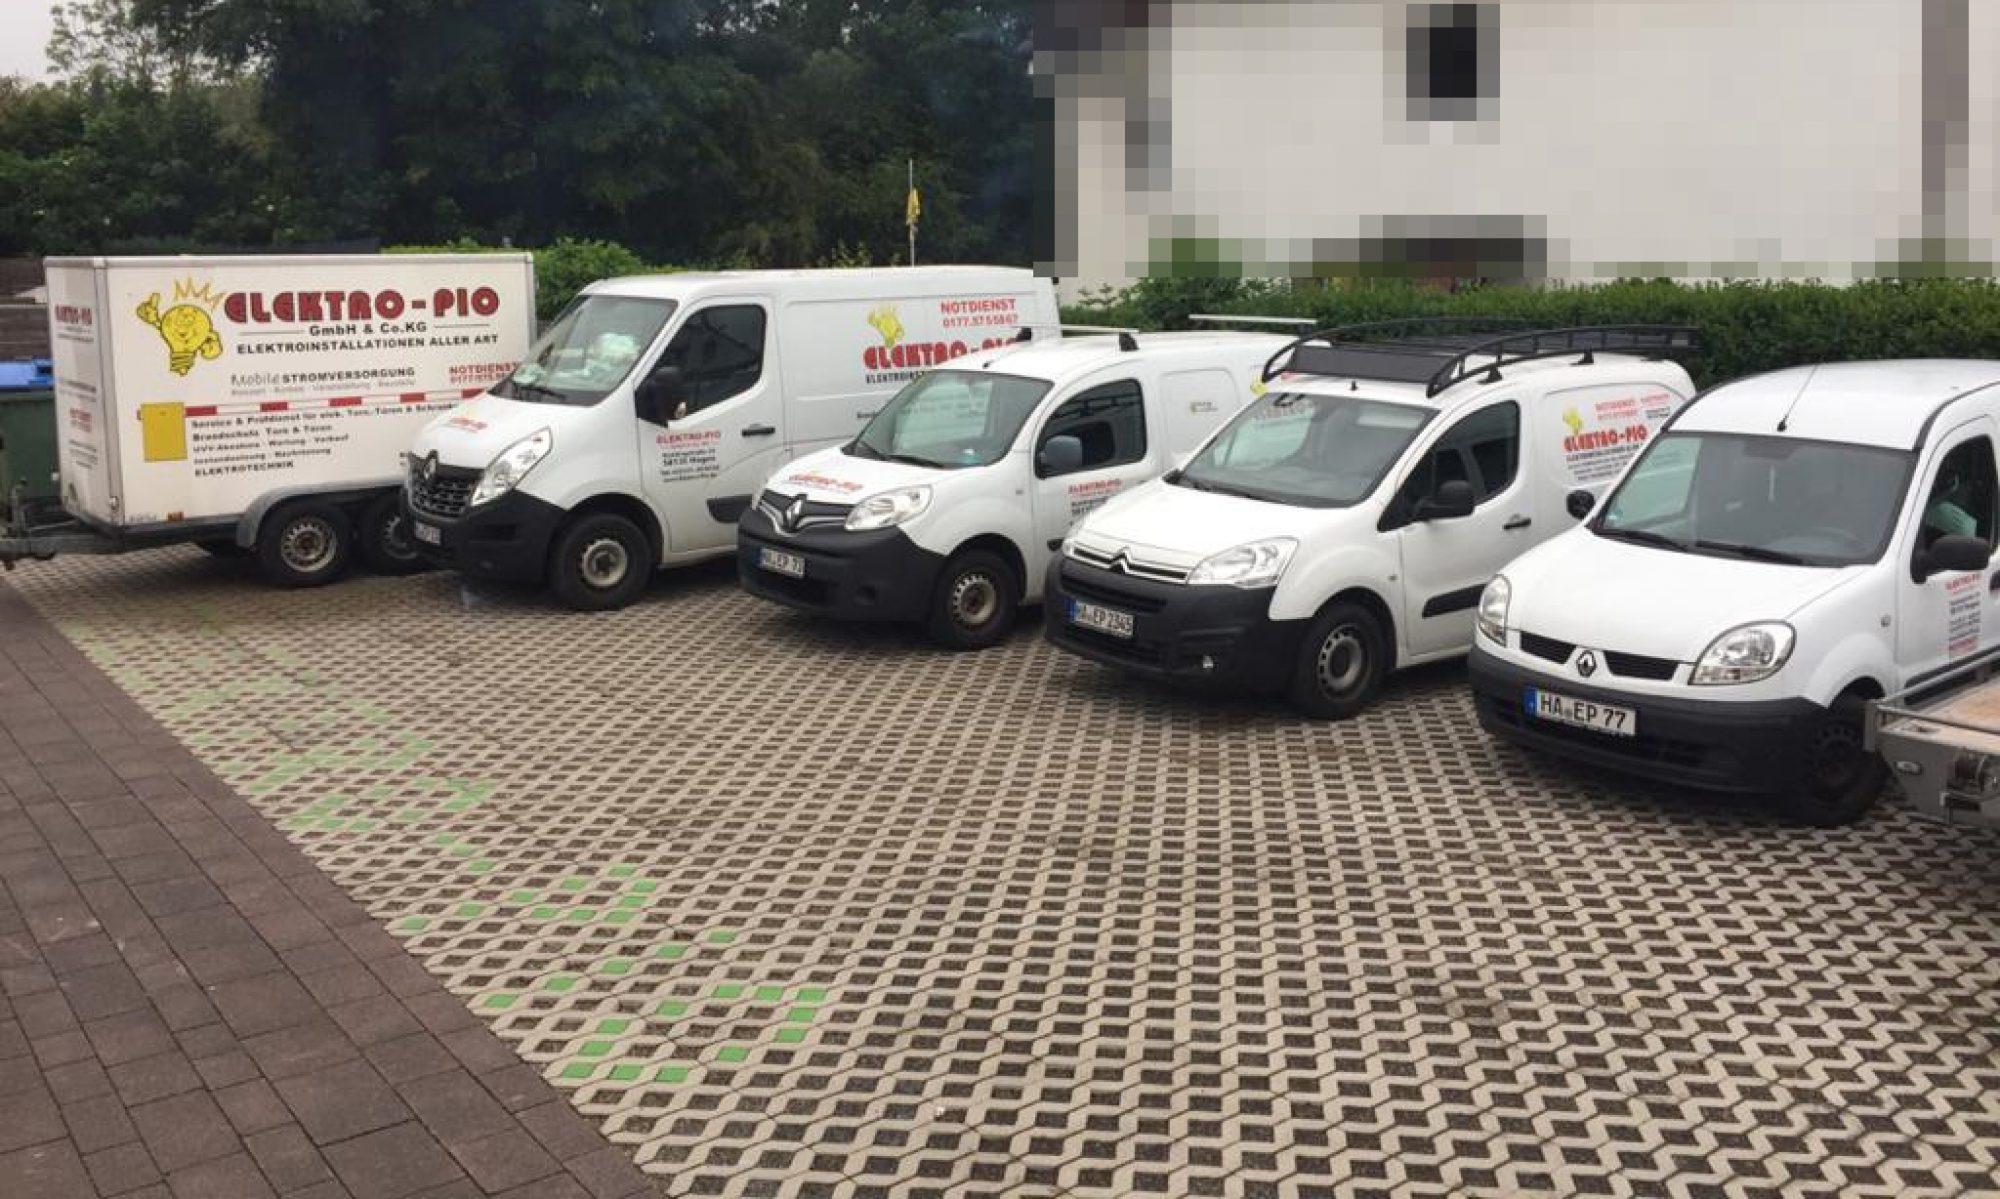 Elektro Pio GmbH